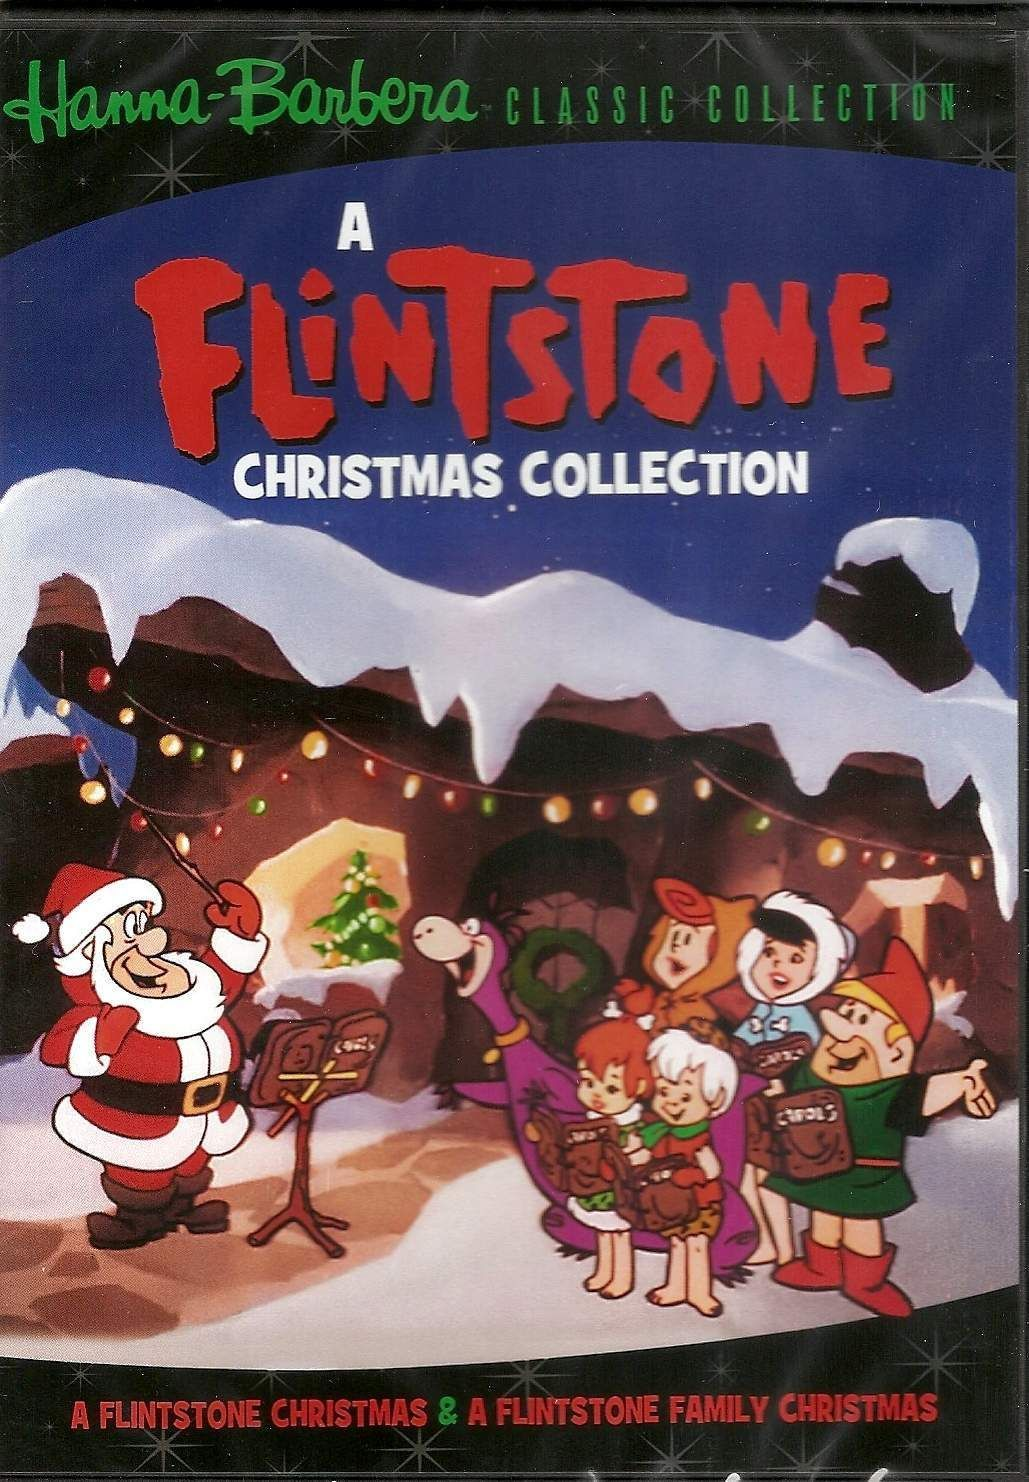 Hanna Barbera Christmas Dvd.Hanna Barbera A Flintstone Christmas Collection A